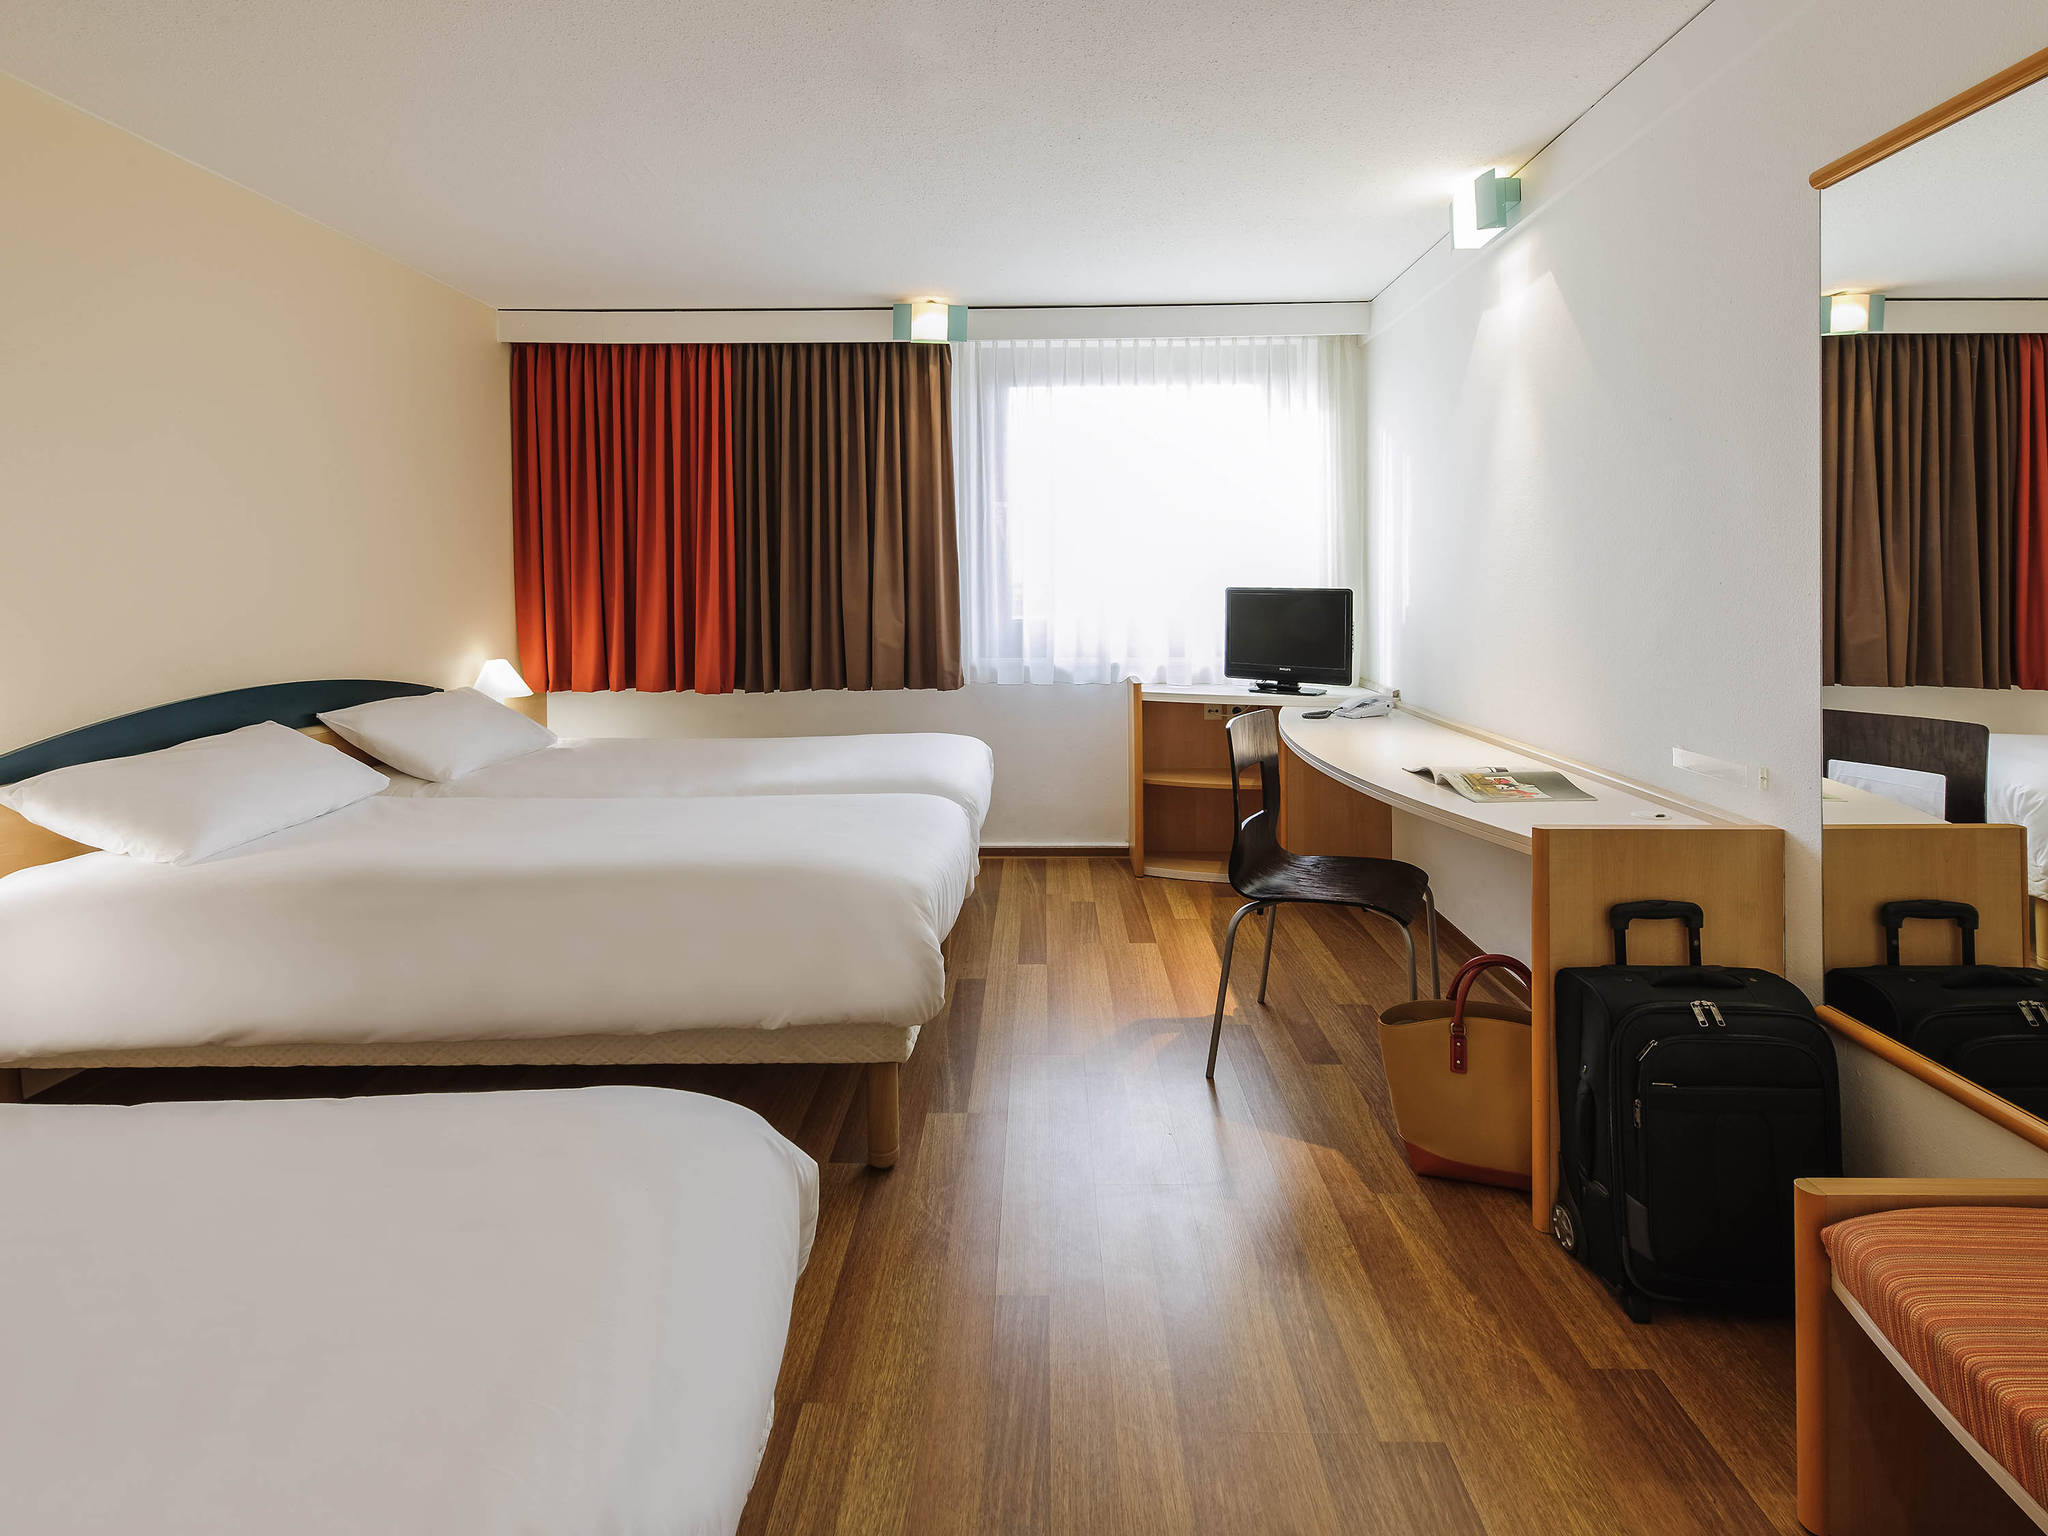 hotell i berlin ibis berlin messe. Black Bedroom Furniture Sets. Home Design Ideas